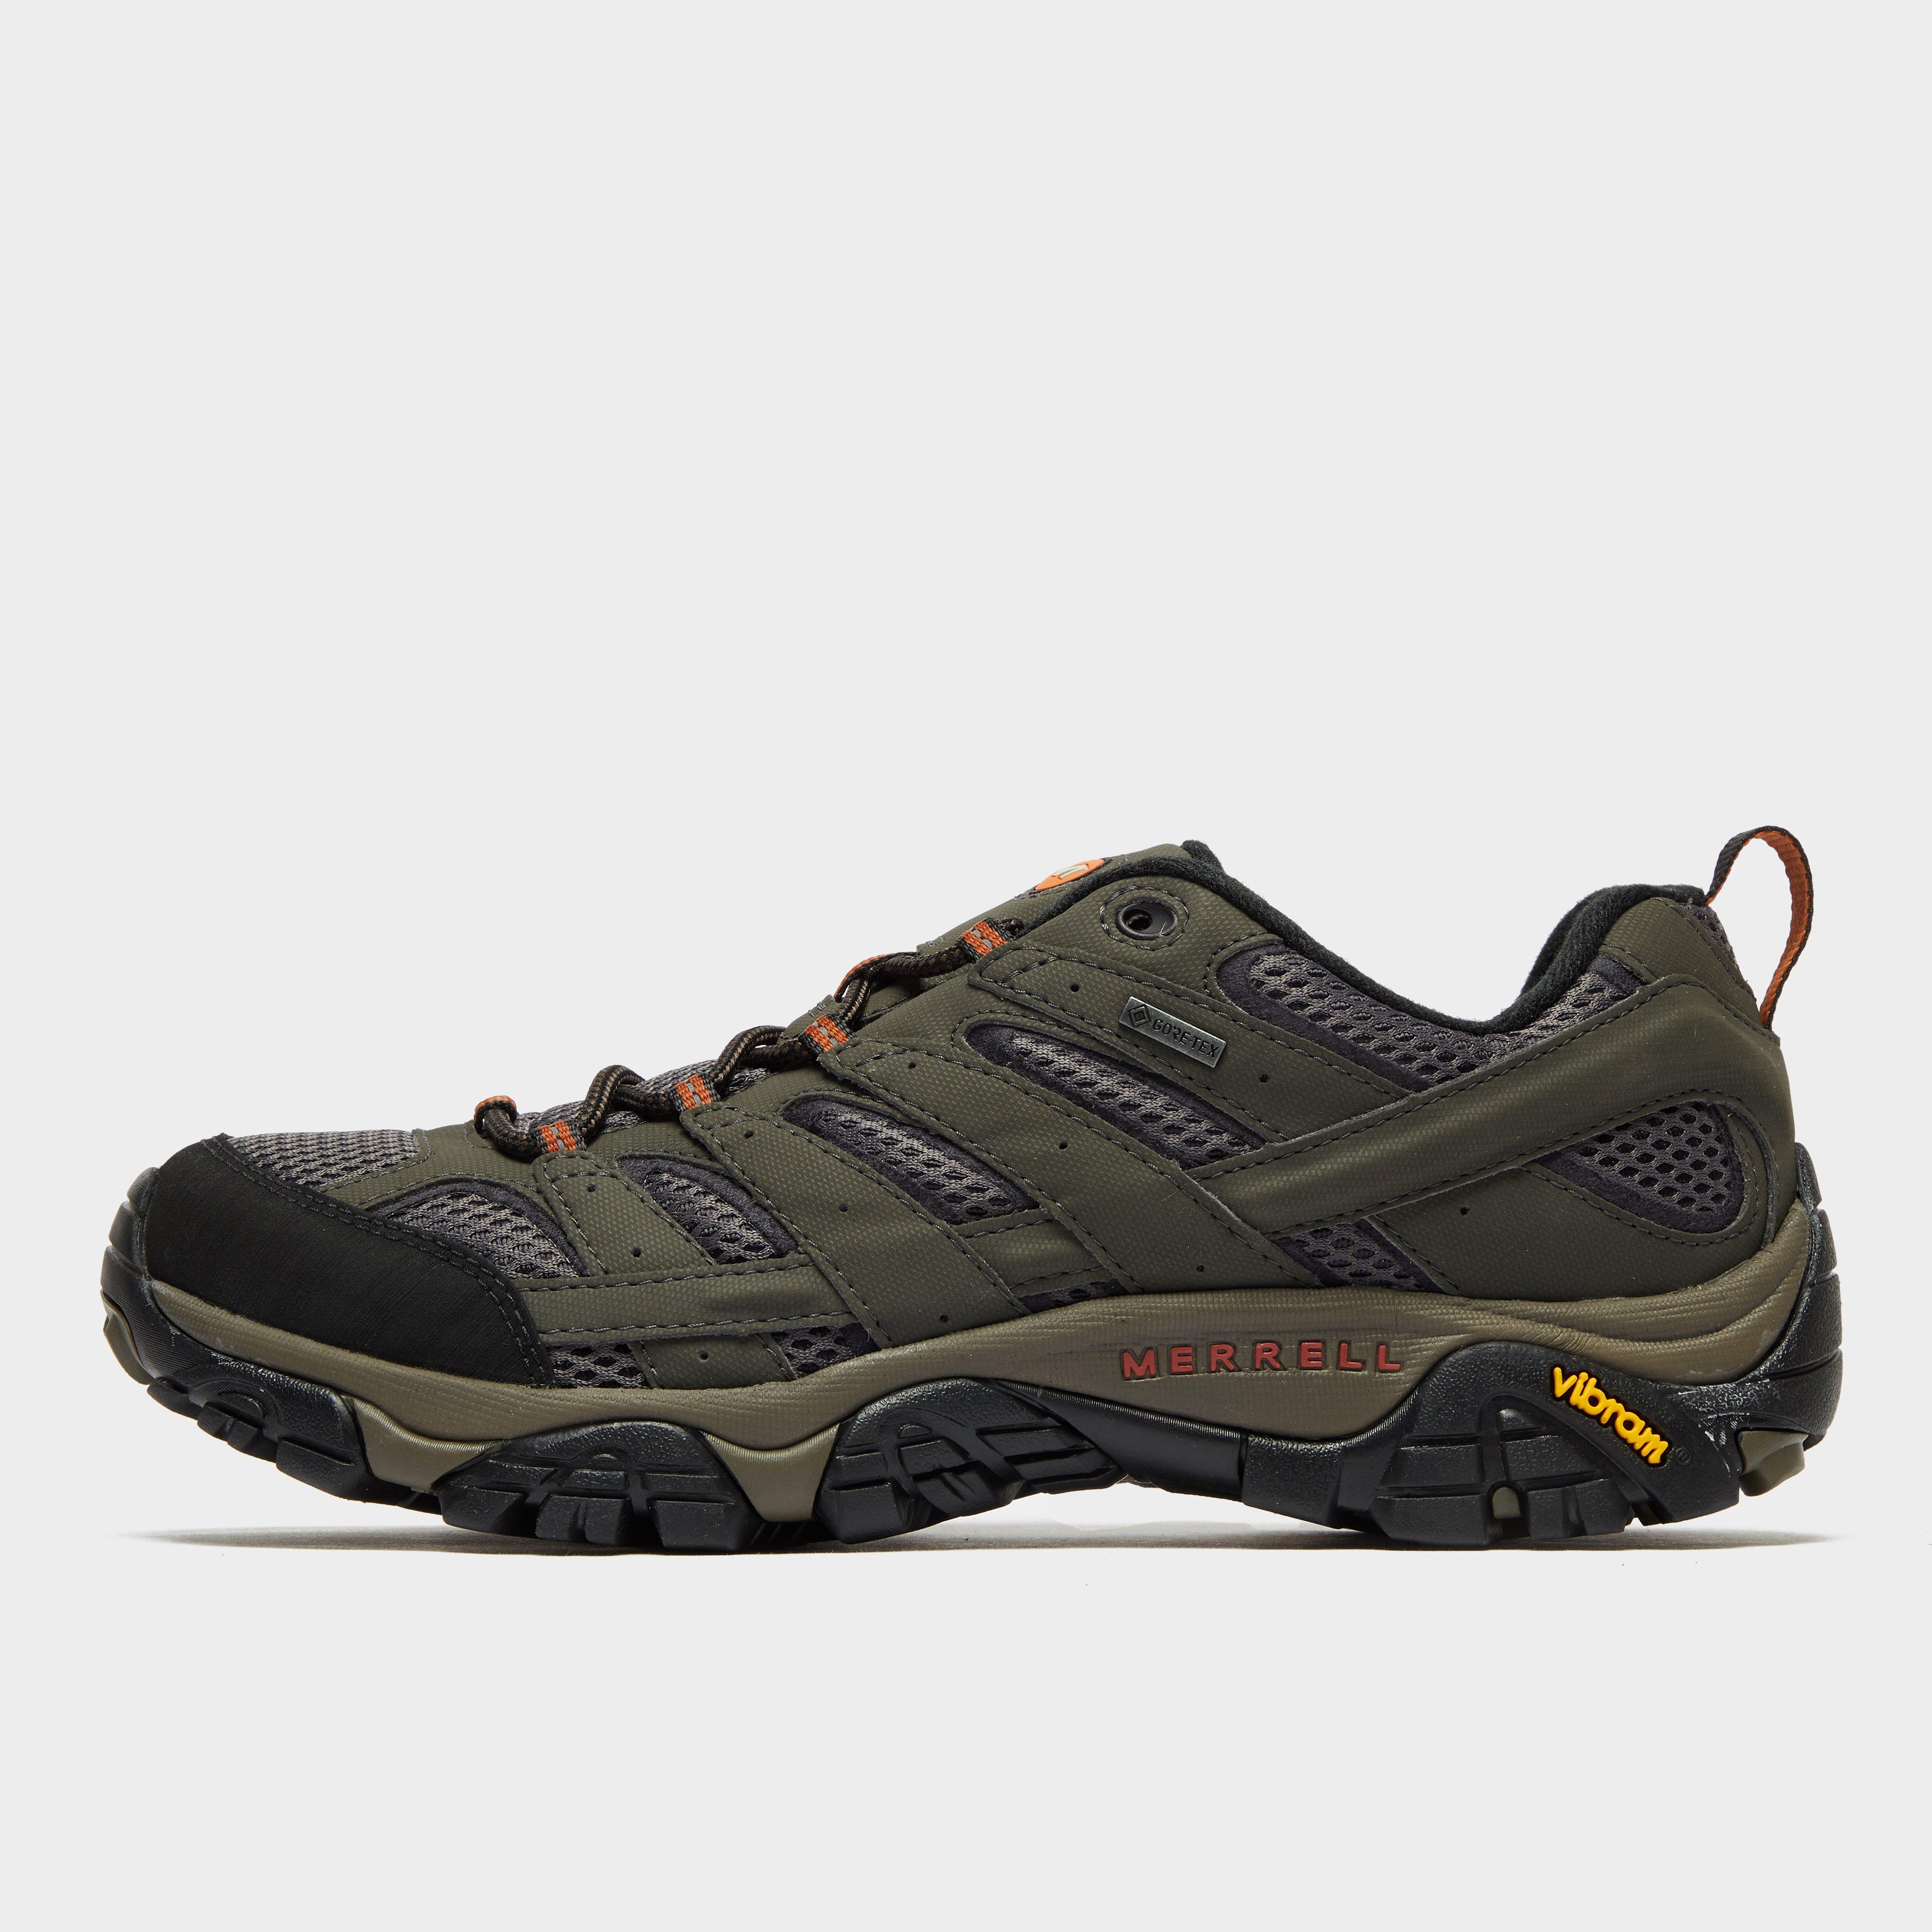 Merrell Mens Moab Gore-Tex Hiking Shoe